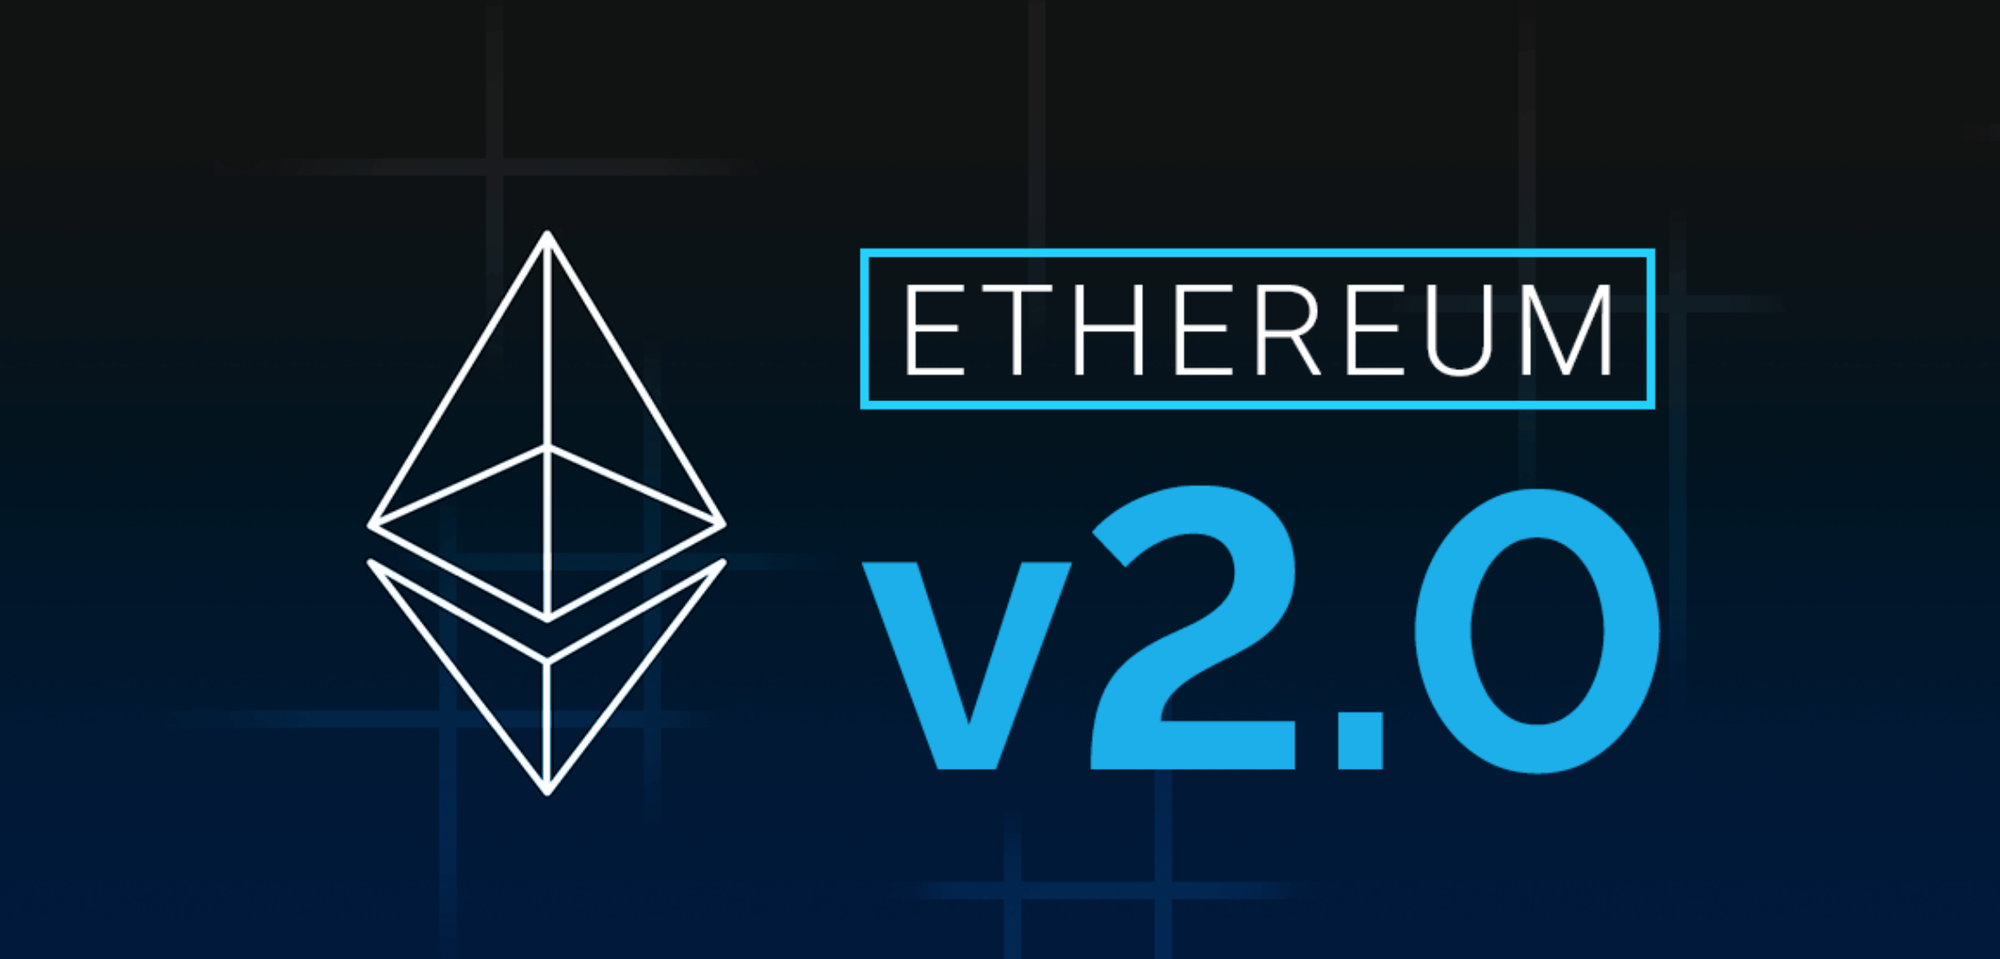 Ethereum 2.0 est en ligne - CryptoNewsHaiti